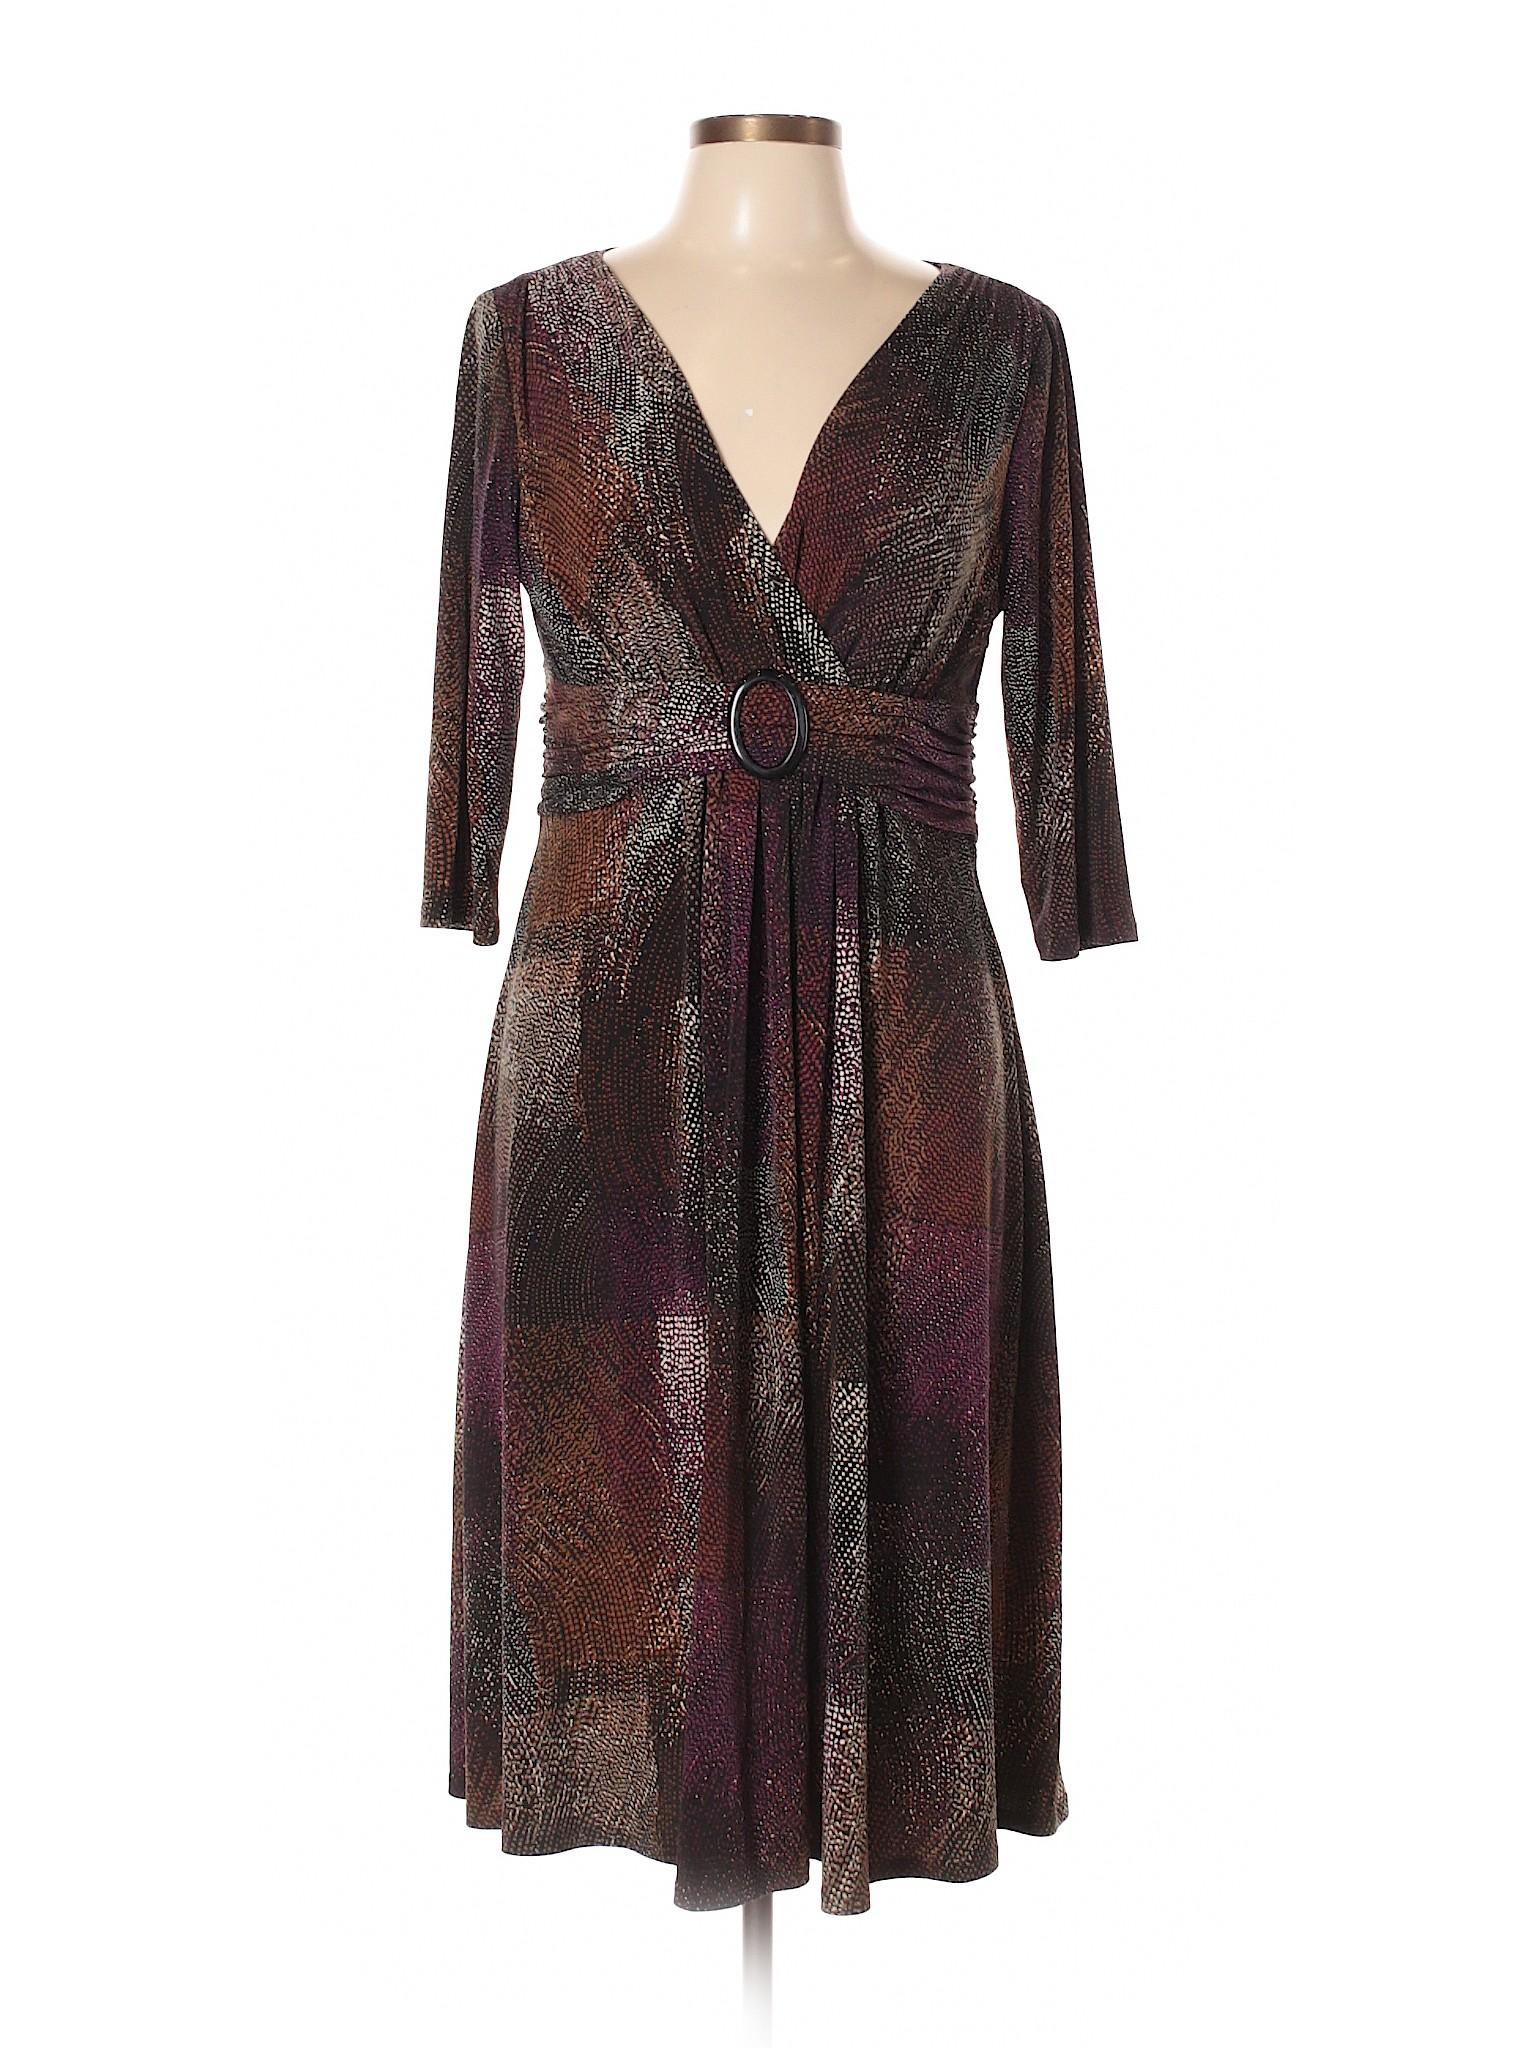 Casual Dress Evan winter Picone Boutique 4xawtqSzn